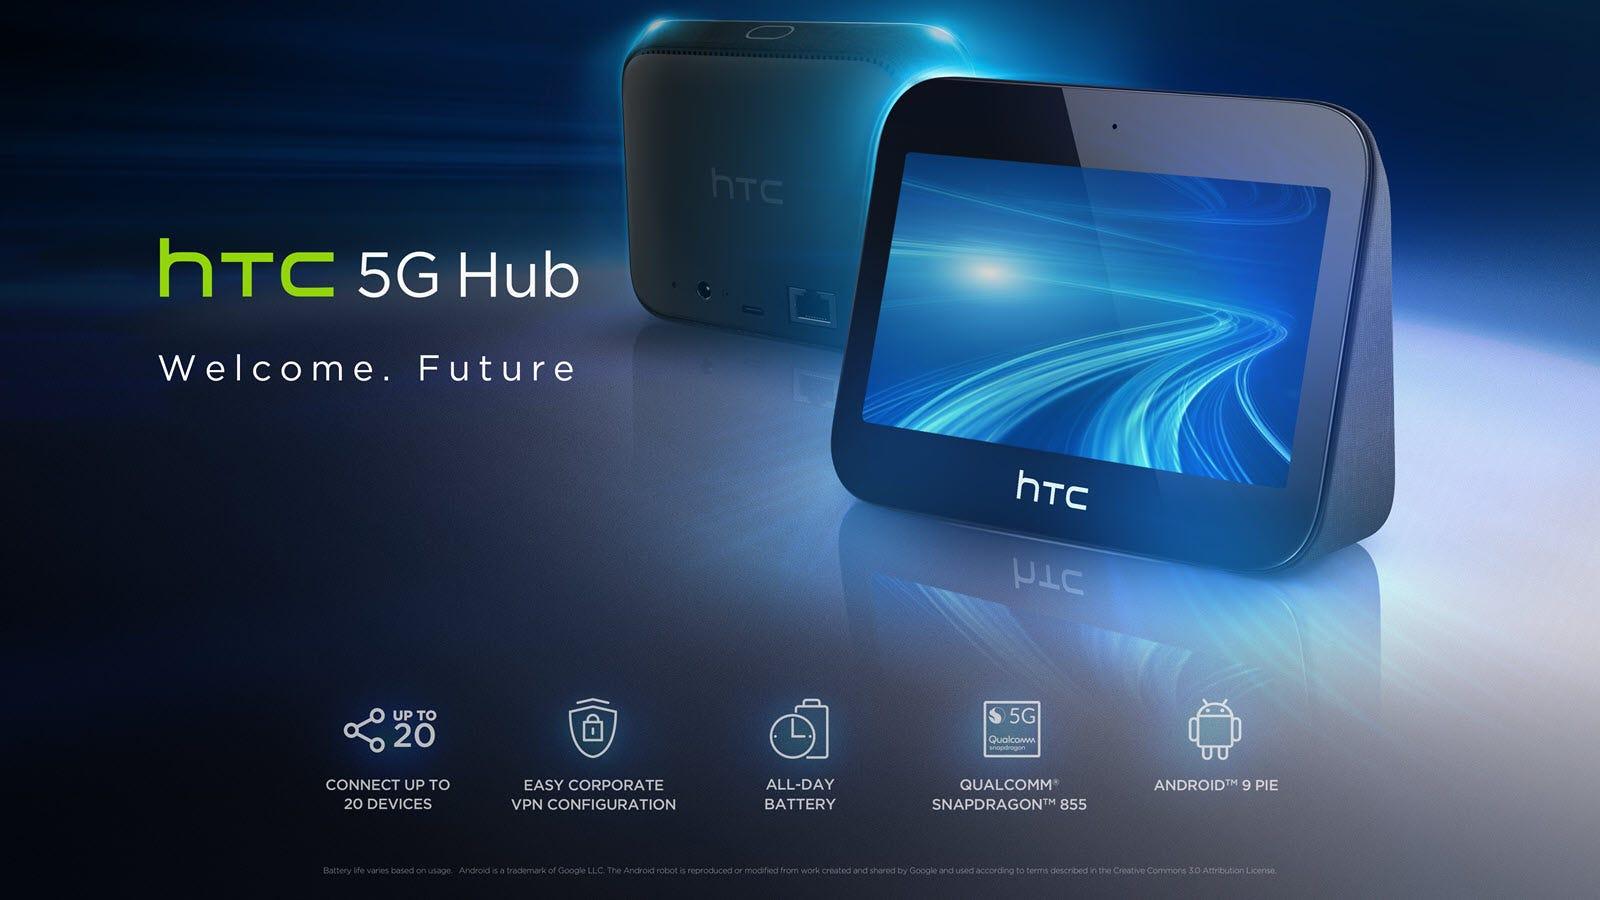 HTC 5G Hub device